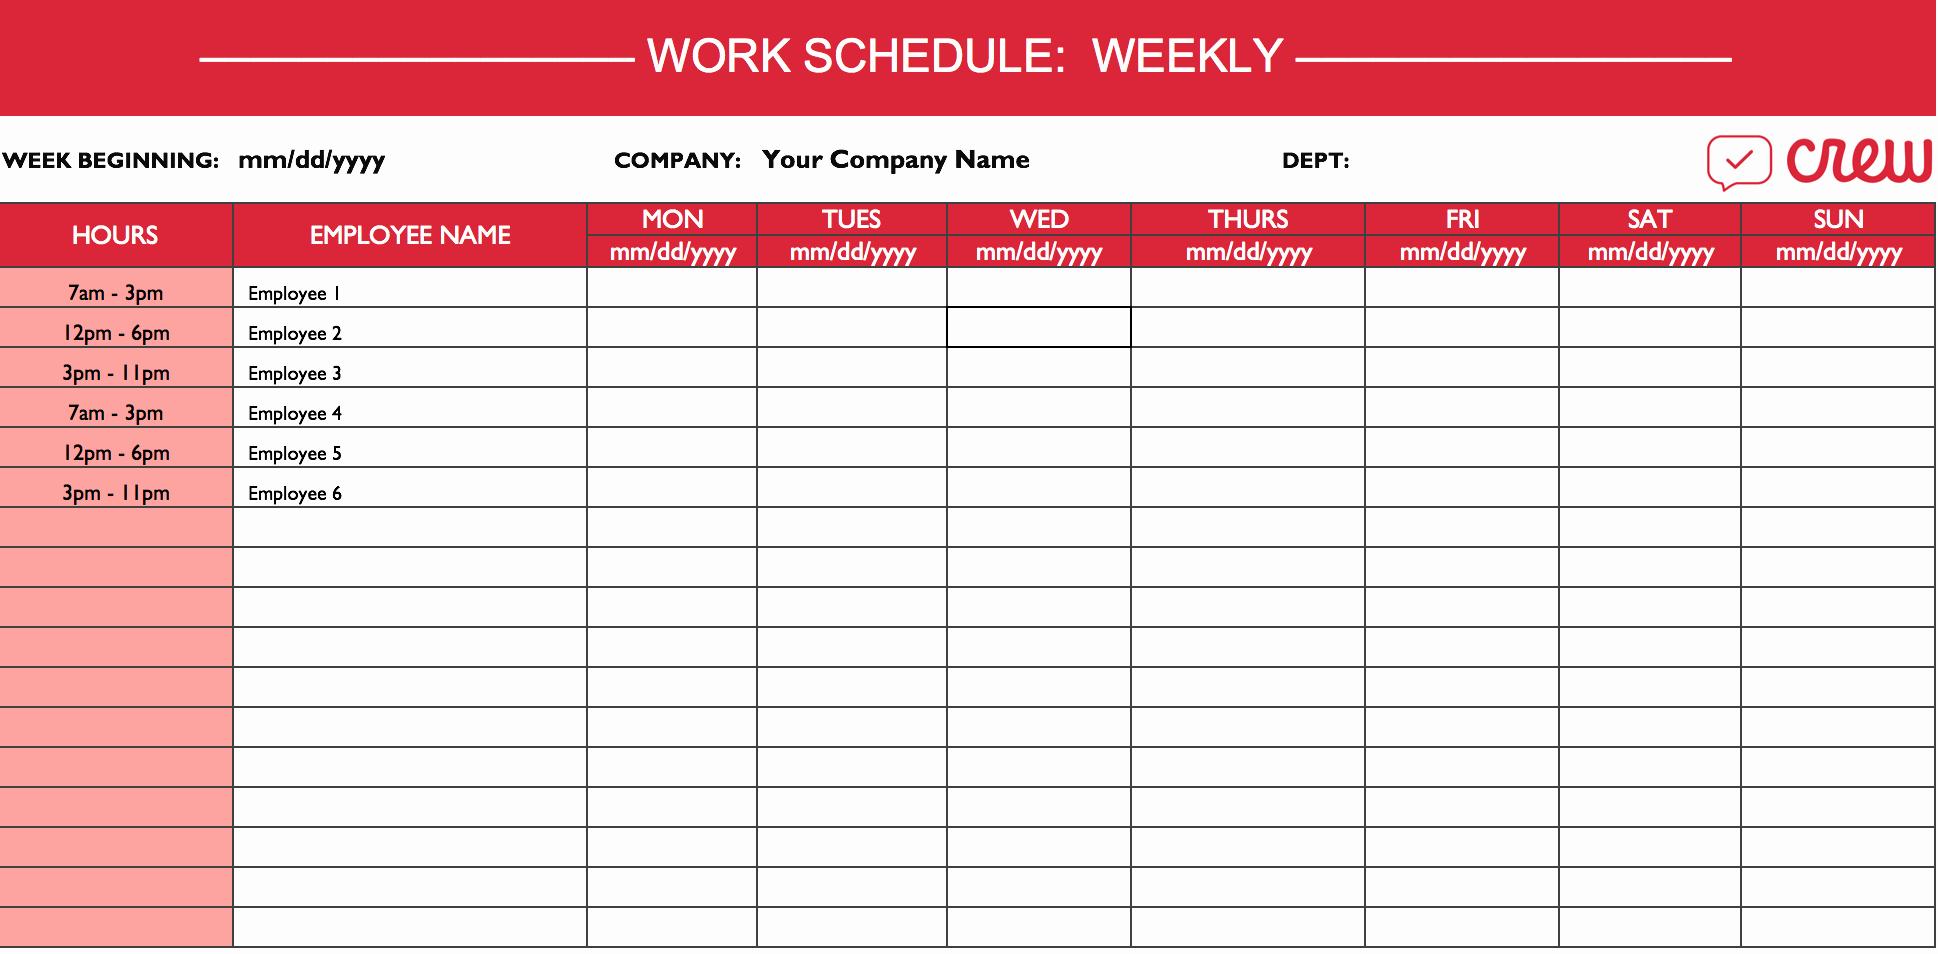 Work Hour Schedule Template Elegant Weekly Work Schedule Template I Crew